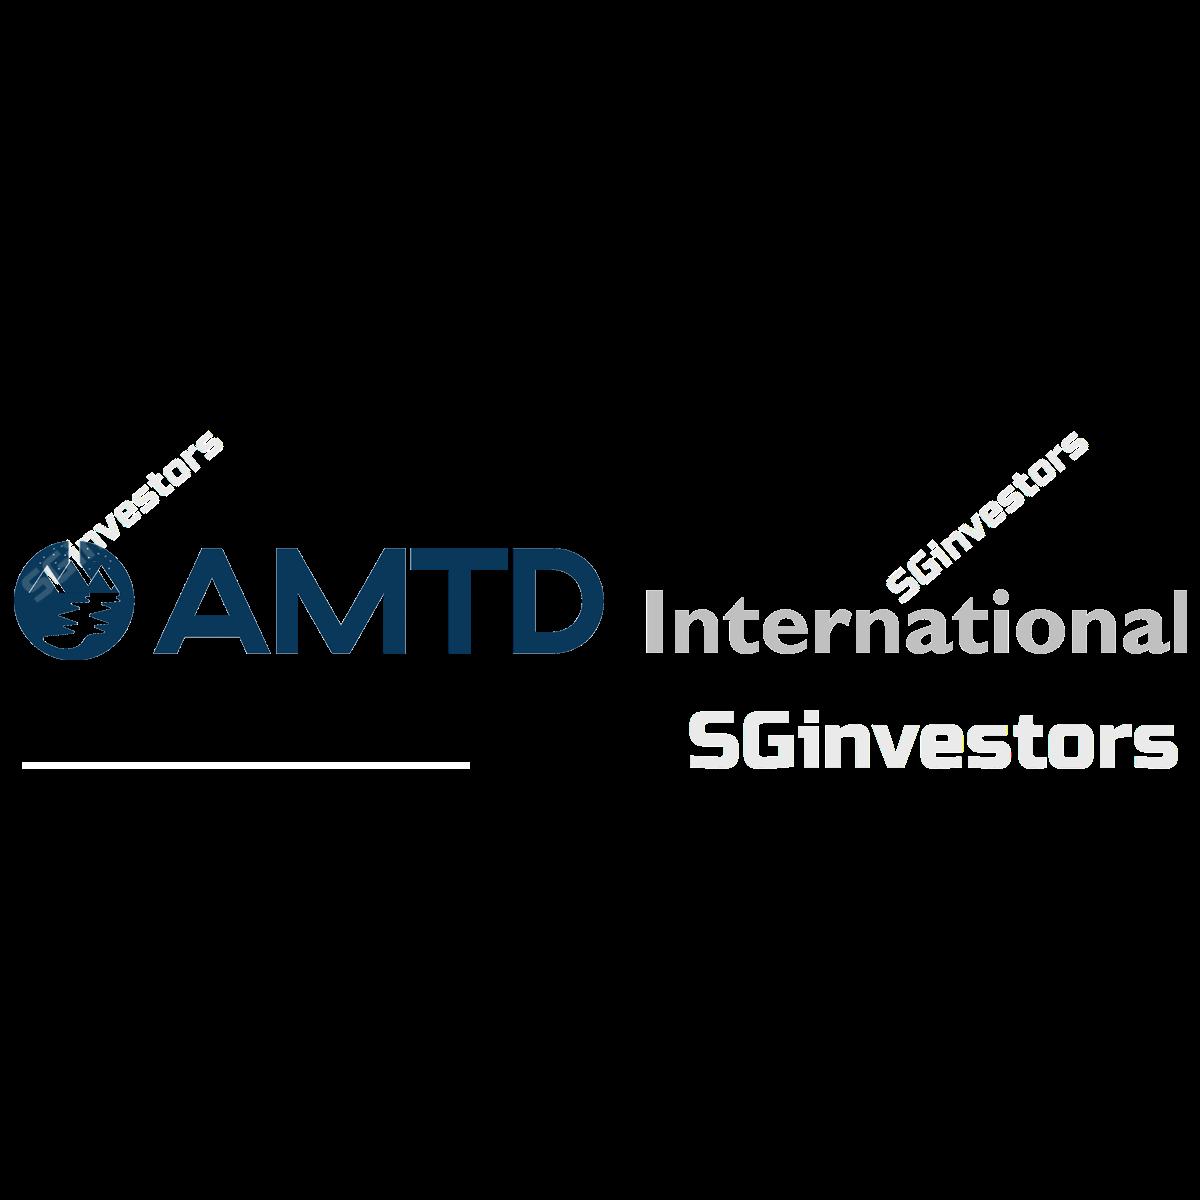 AMTD INTERNATIONAL INC. OV (SGX:HKB) @ SGinvestors.io